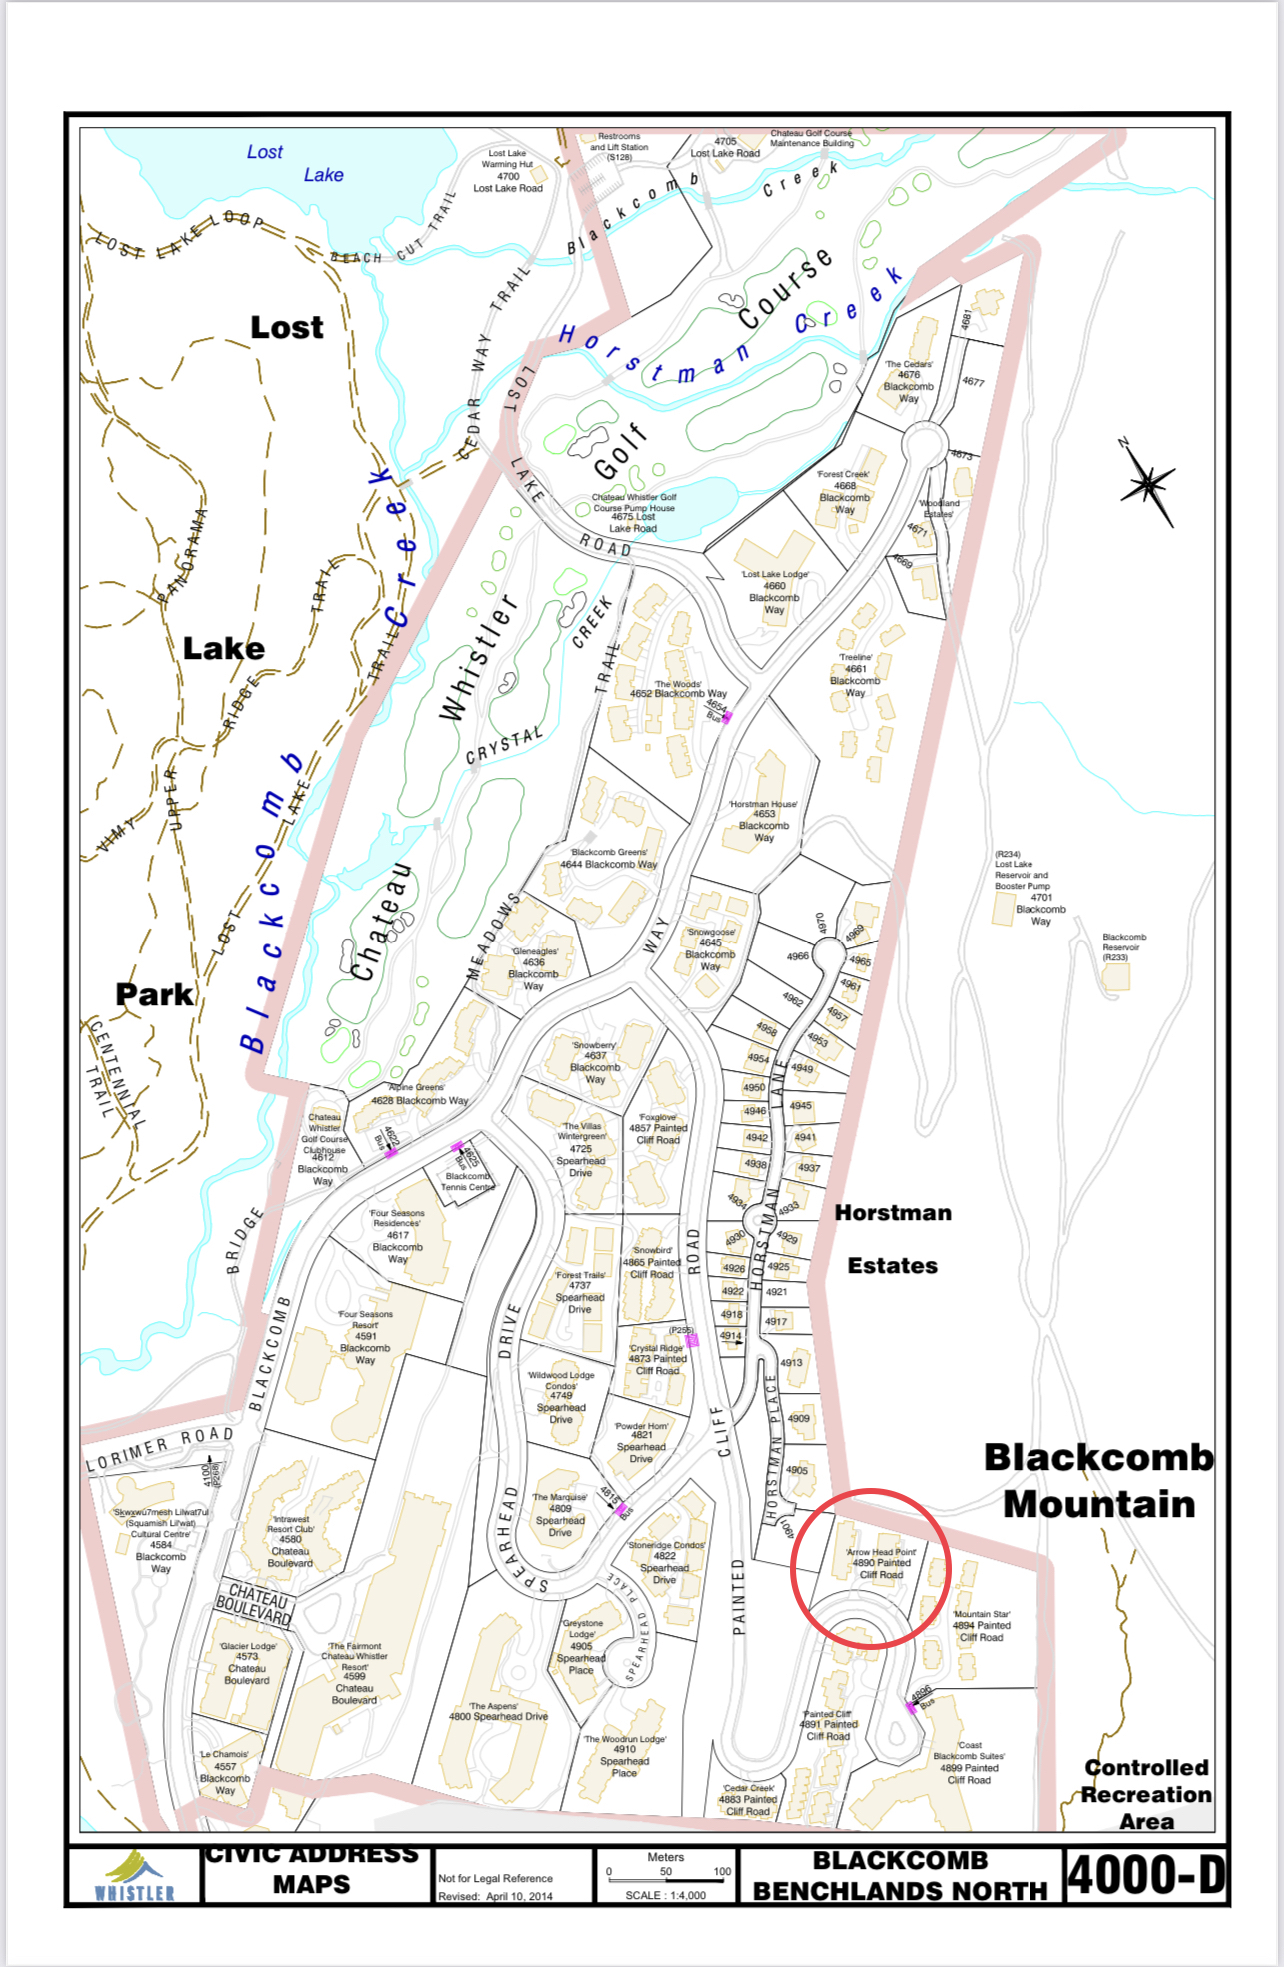 arrowhead point civic address map